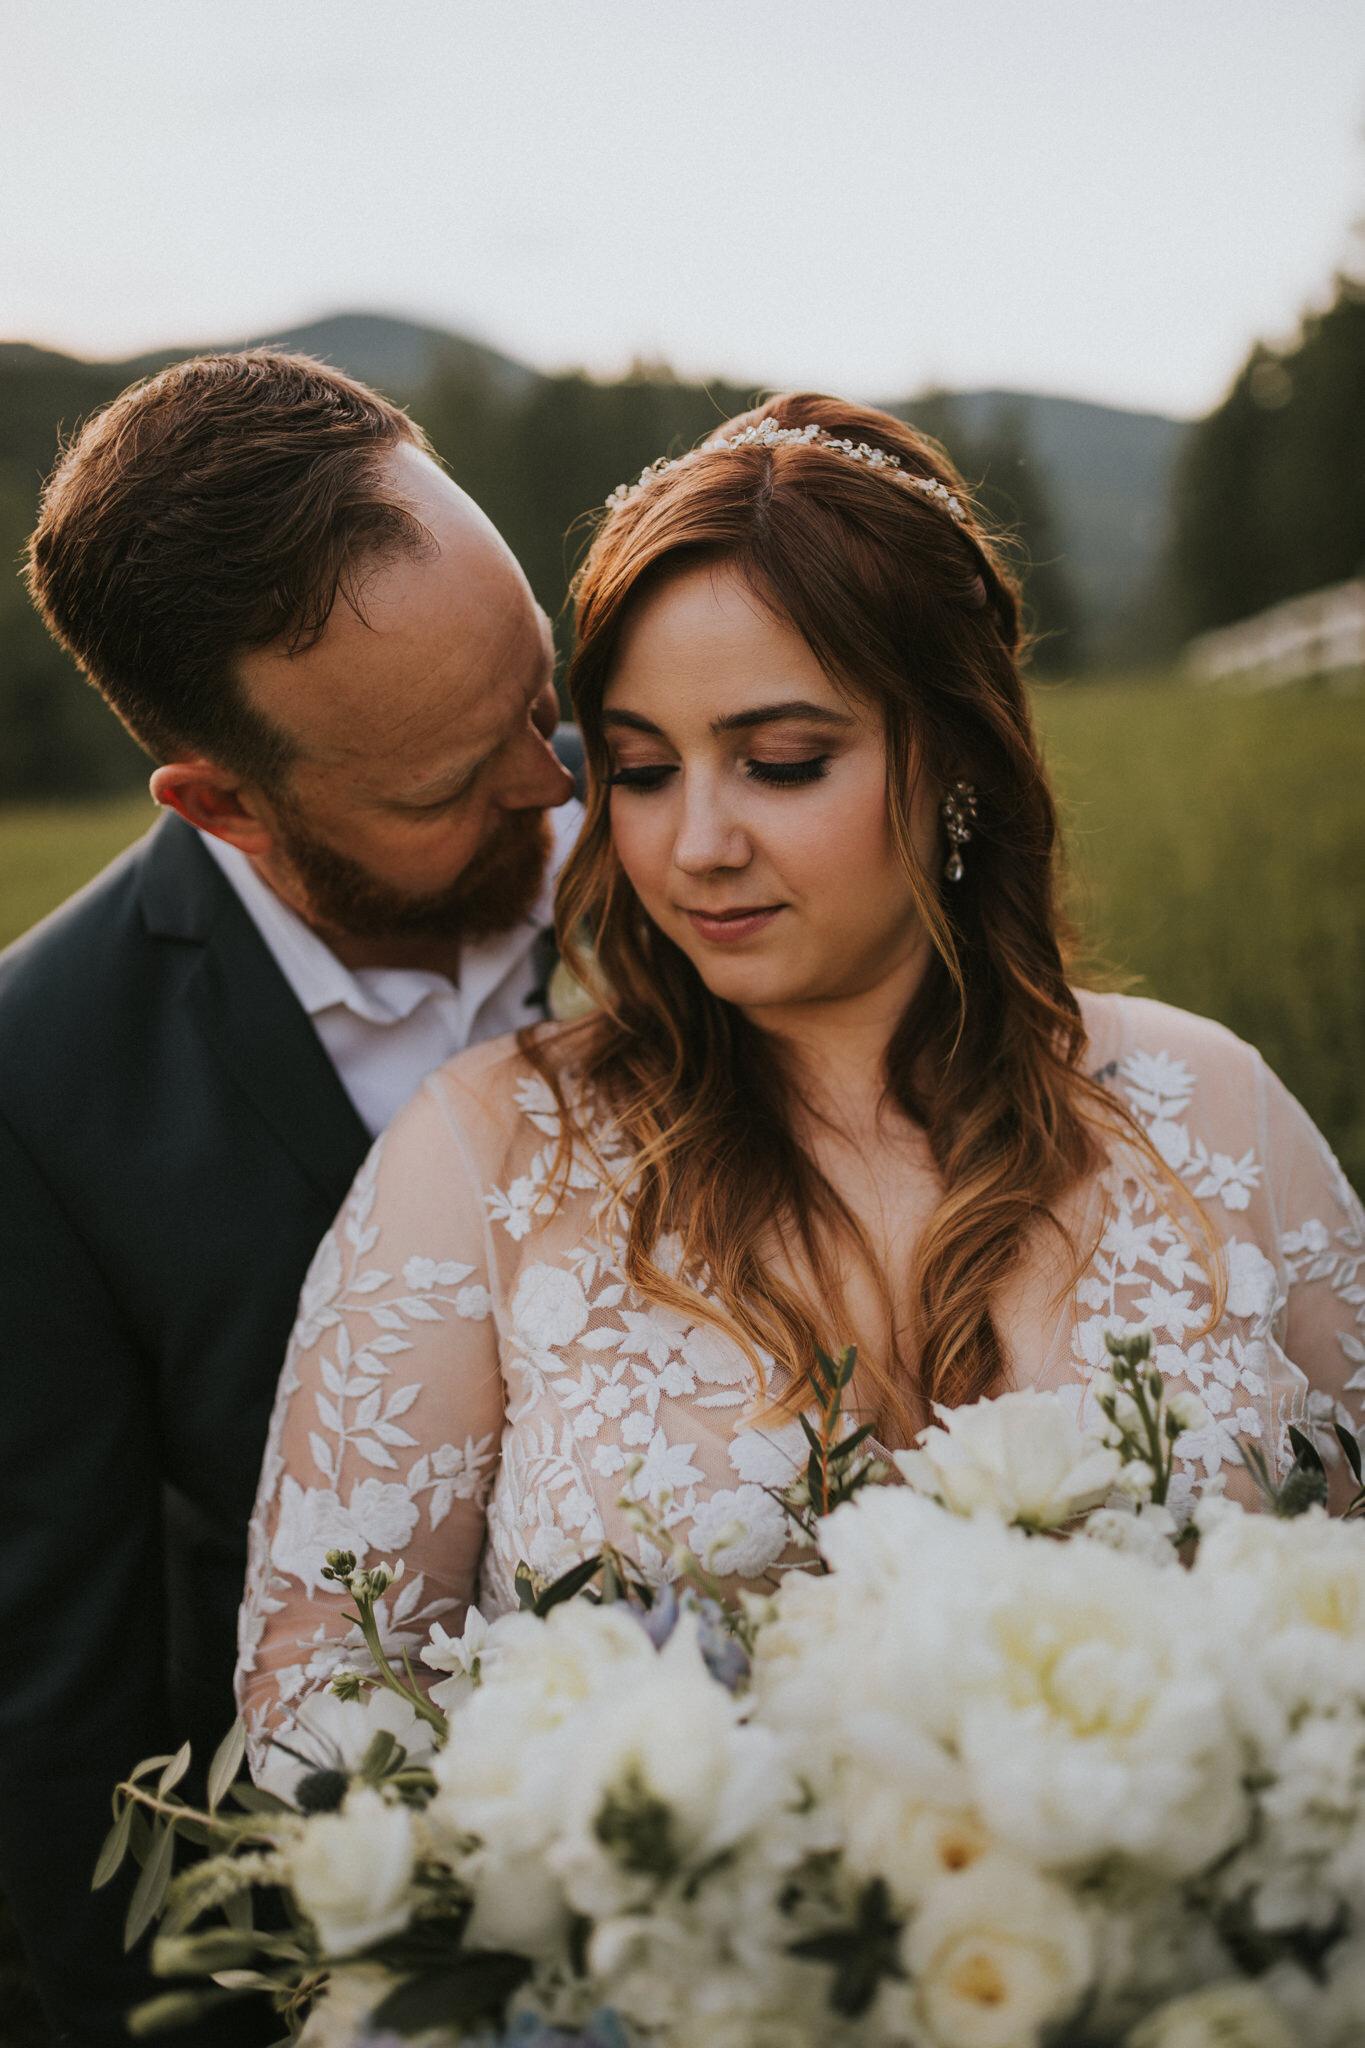 KateMatt-North-Georgia-Wedding-Photographer-Mountain-Laurel-Farm-141.jpg